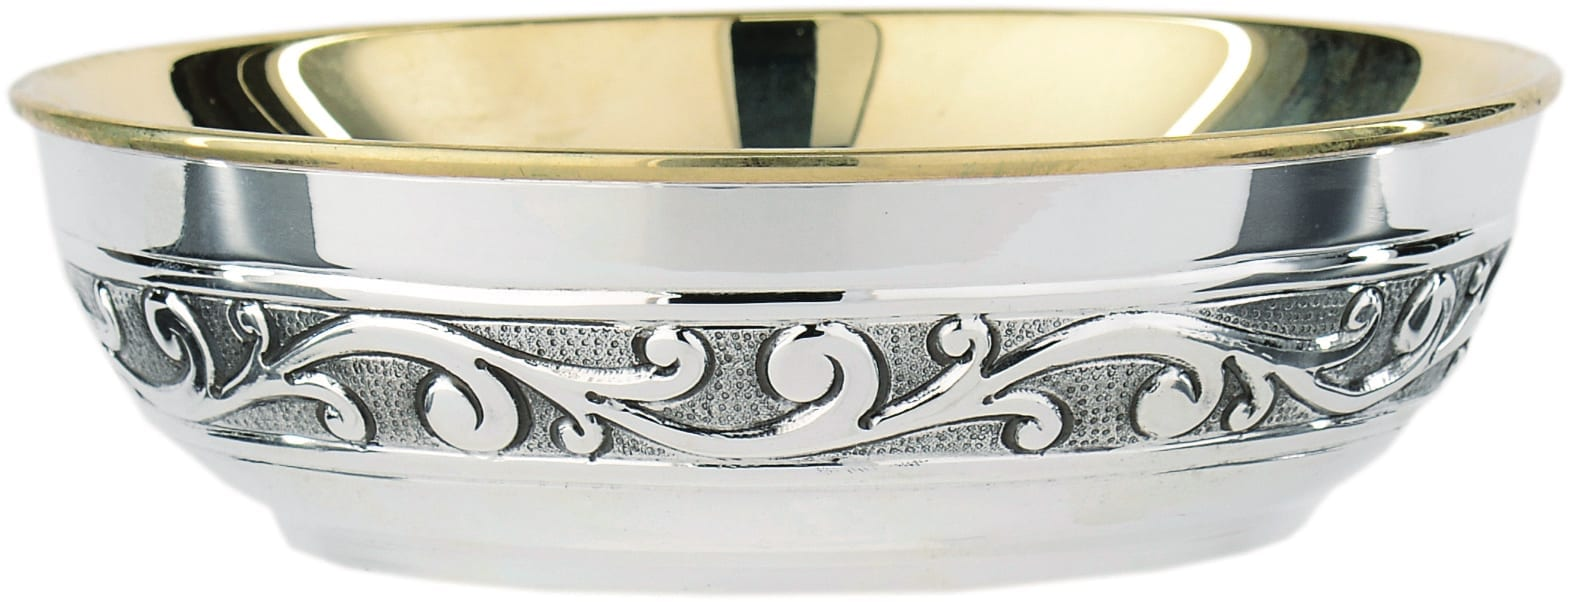 Chiseled silver plate art 6282/b